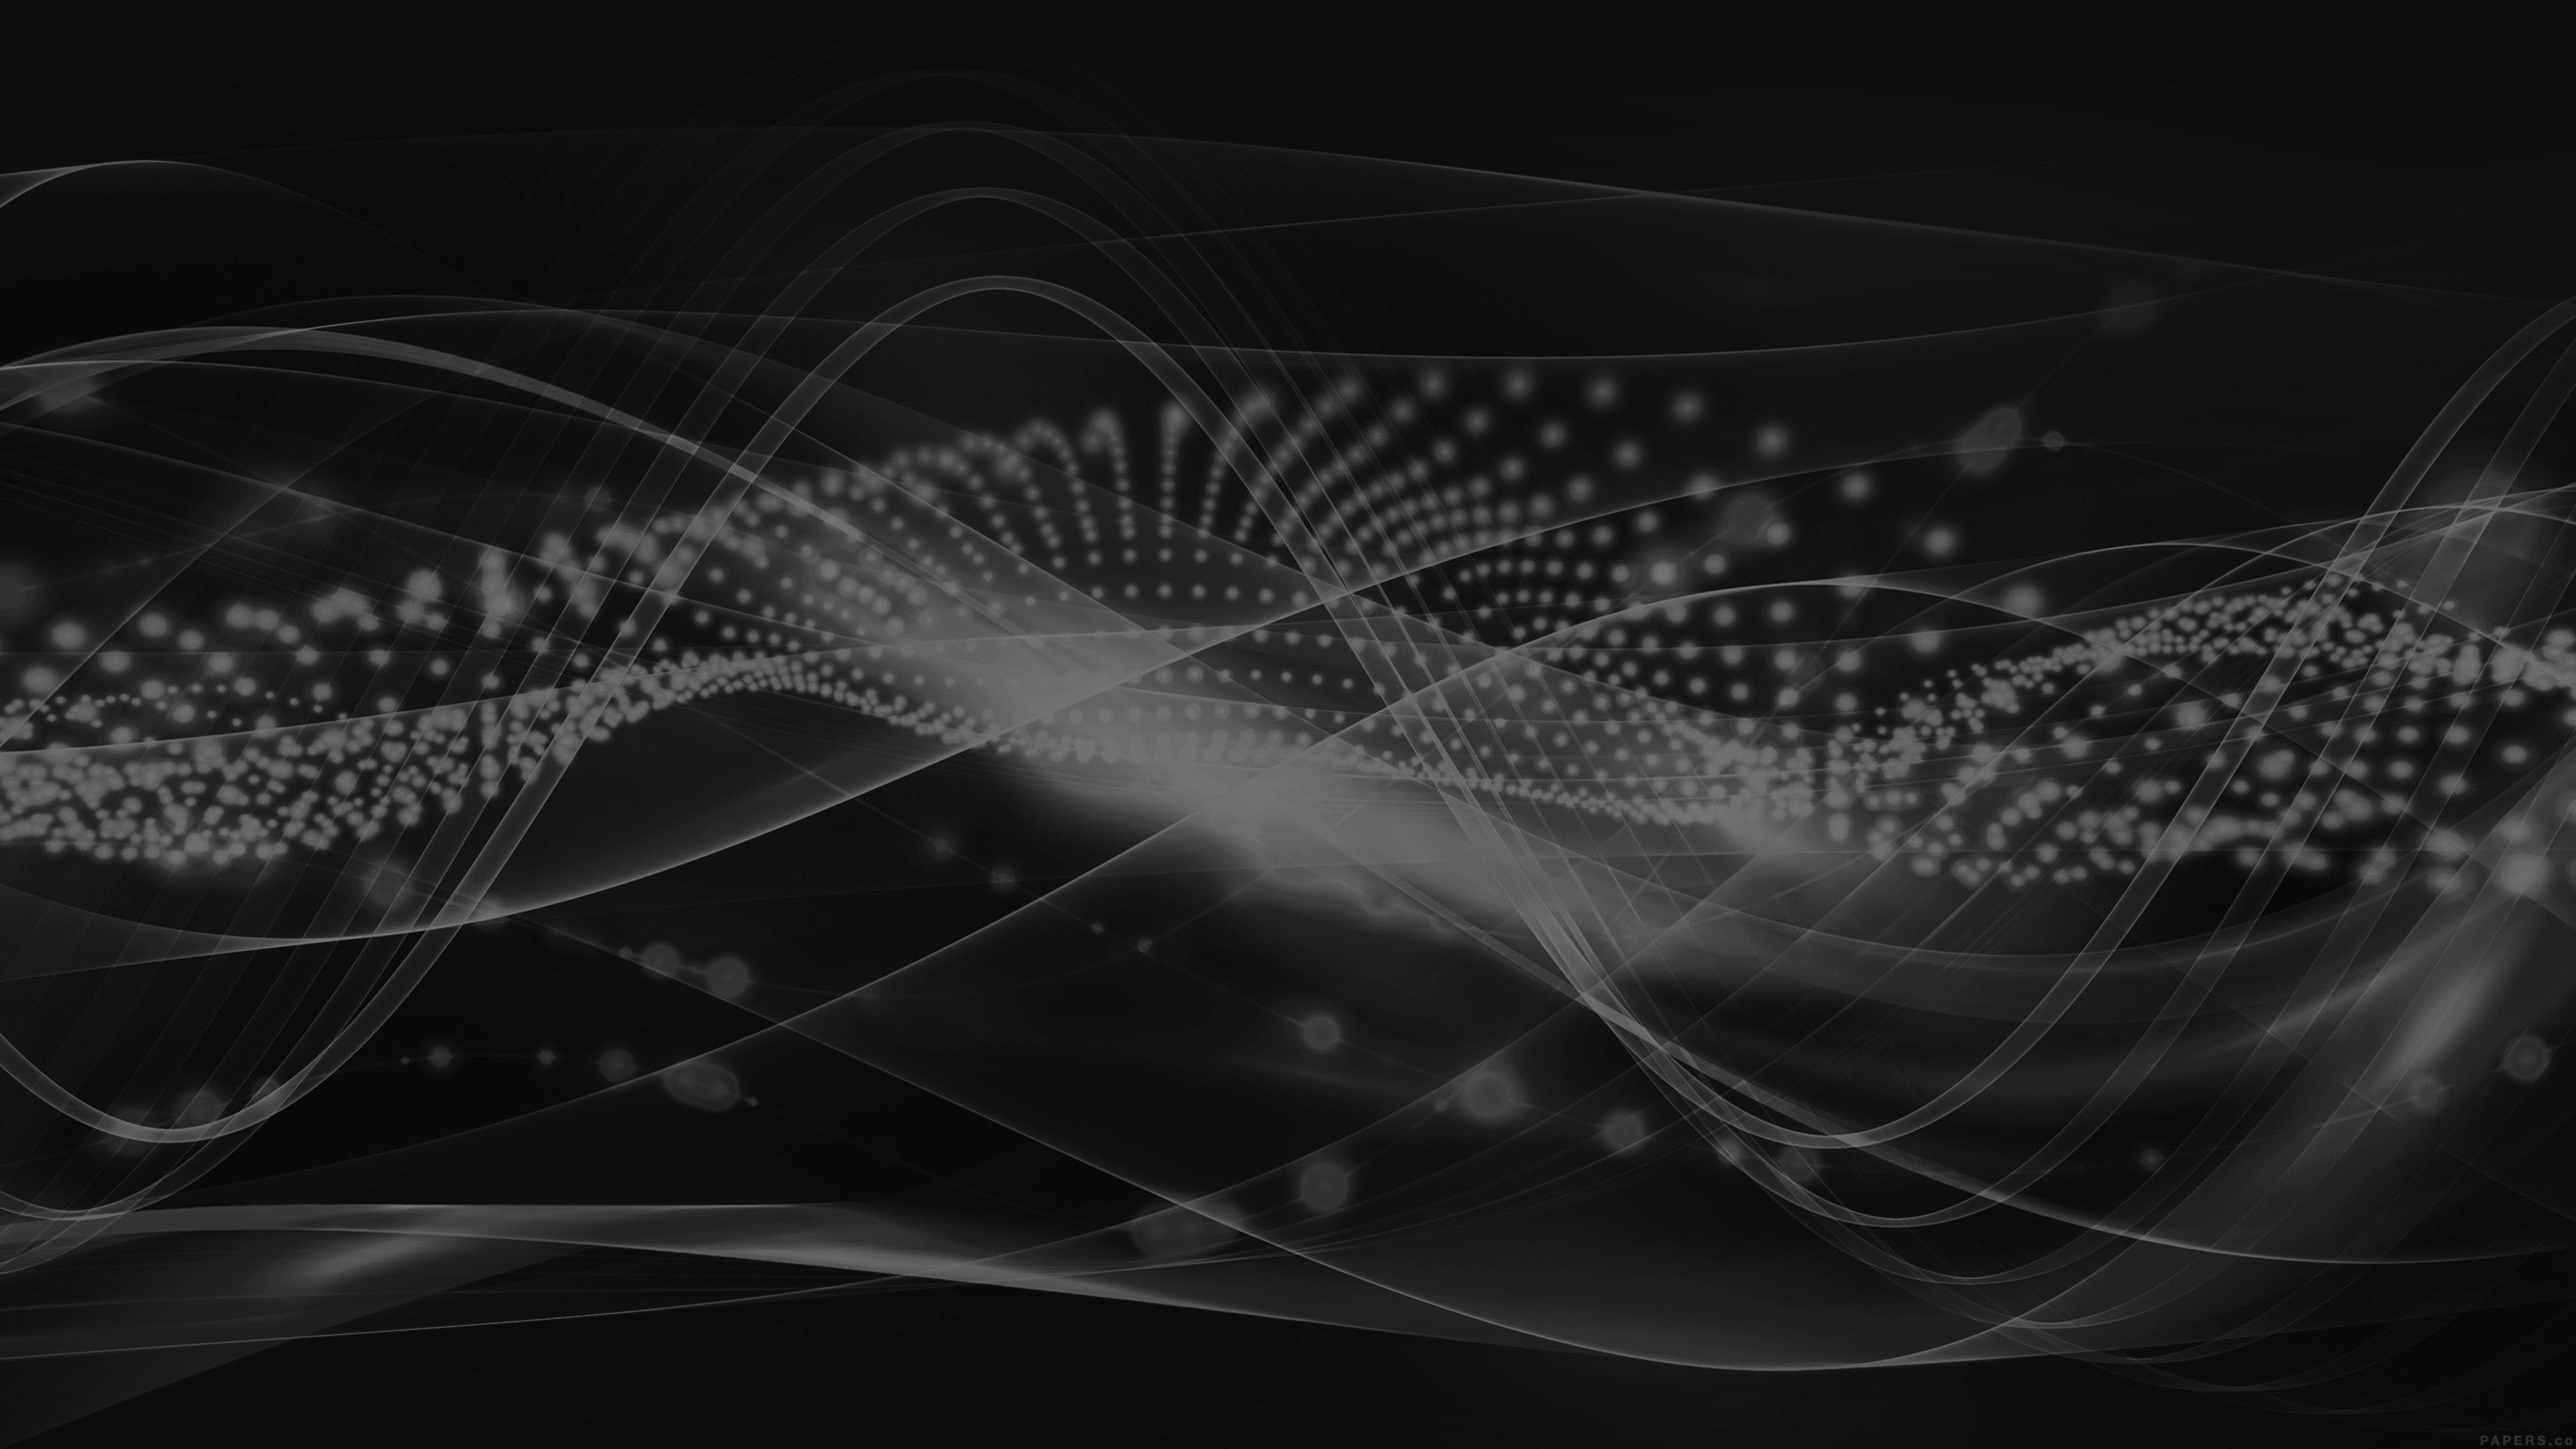 Wallpaper For Desktop Laptop Vh15 Abstract Lines Dark